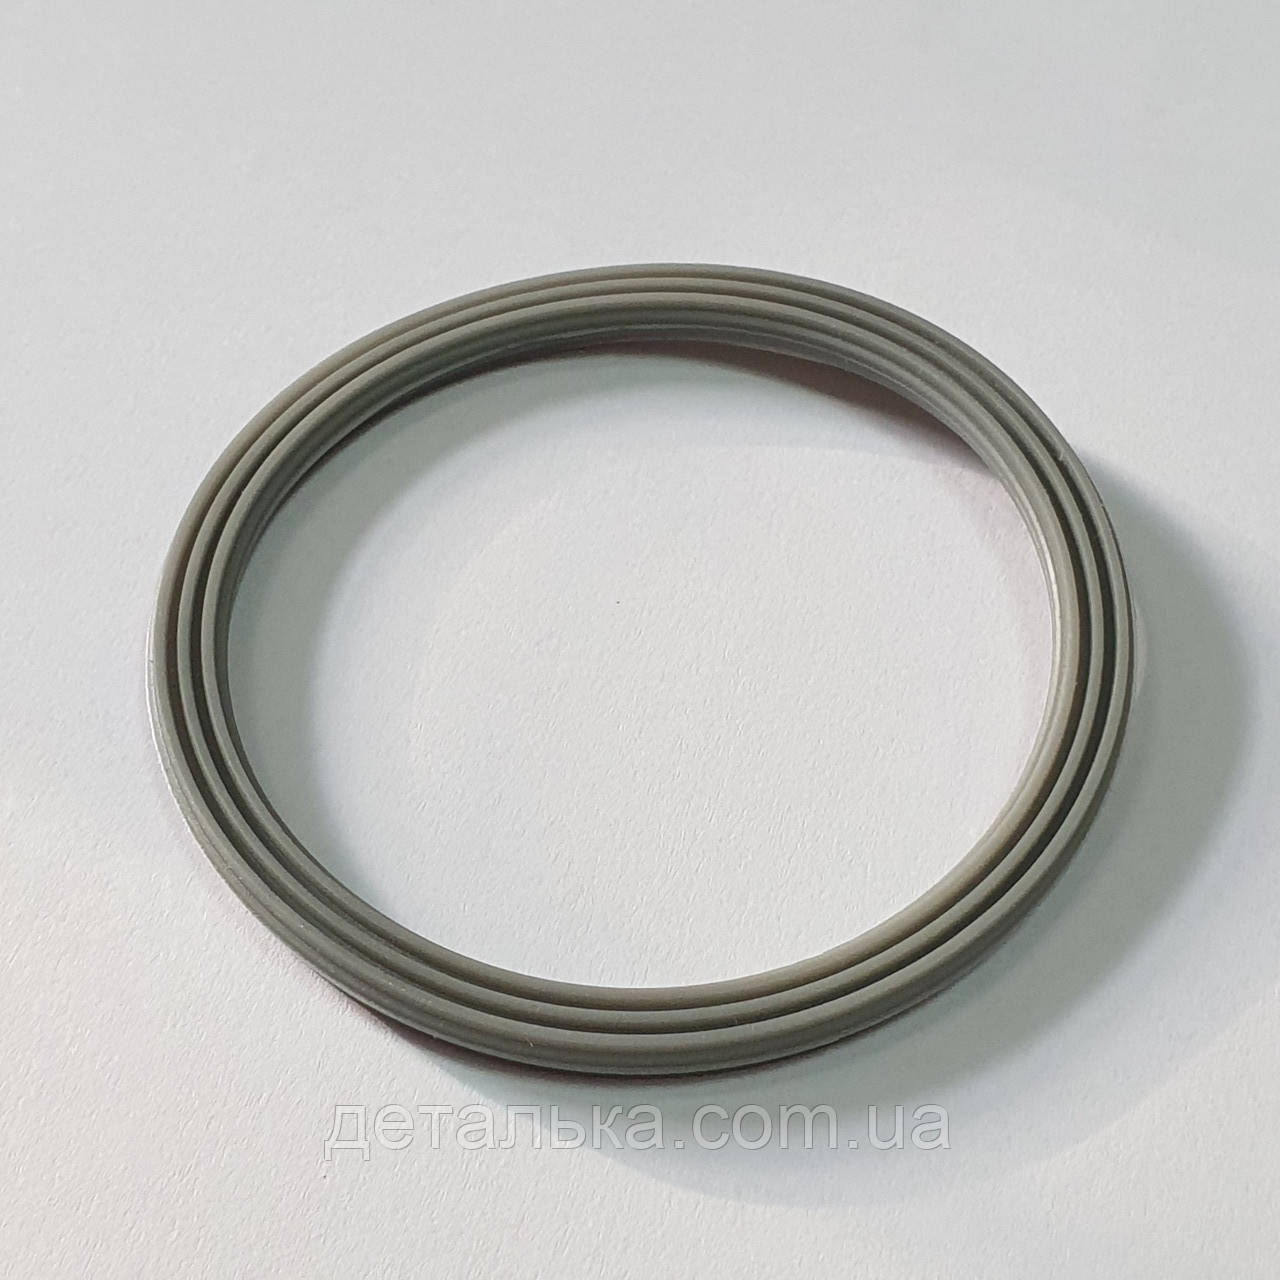 Ущільнювальна гумка для блендера Philips HR2600